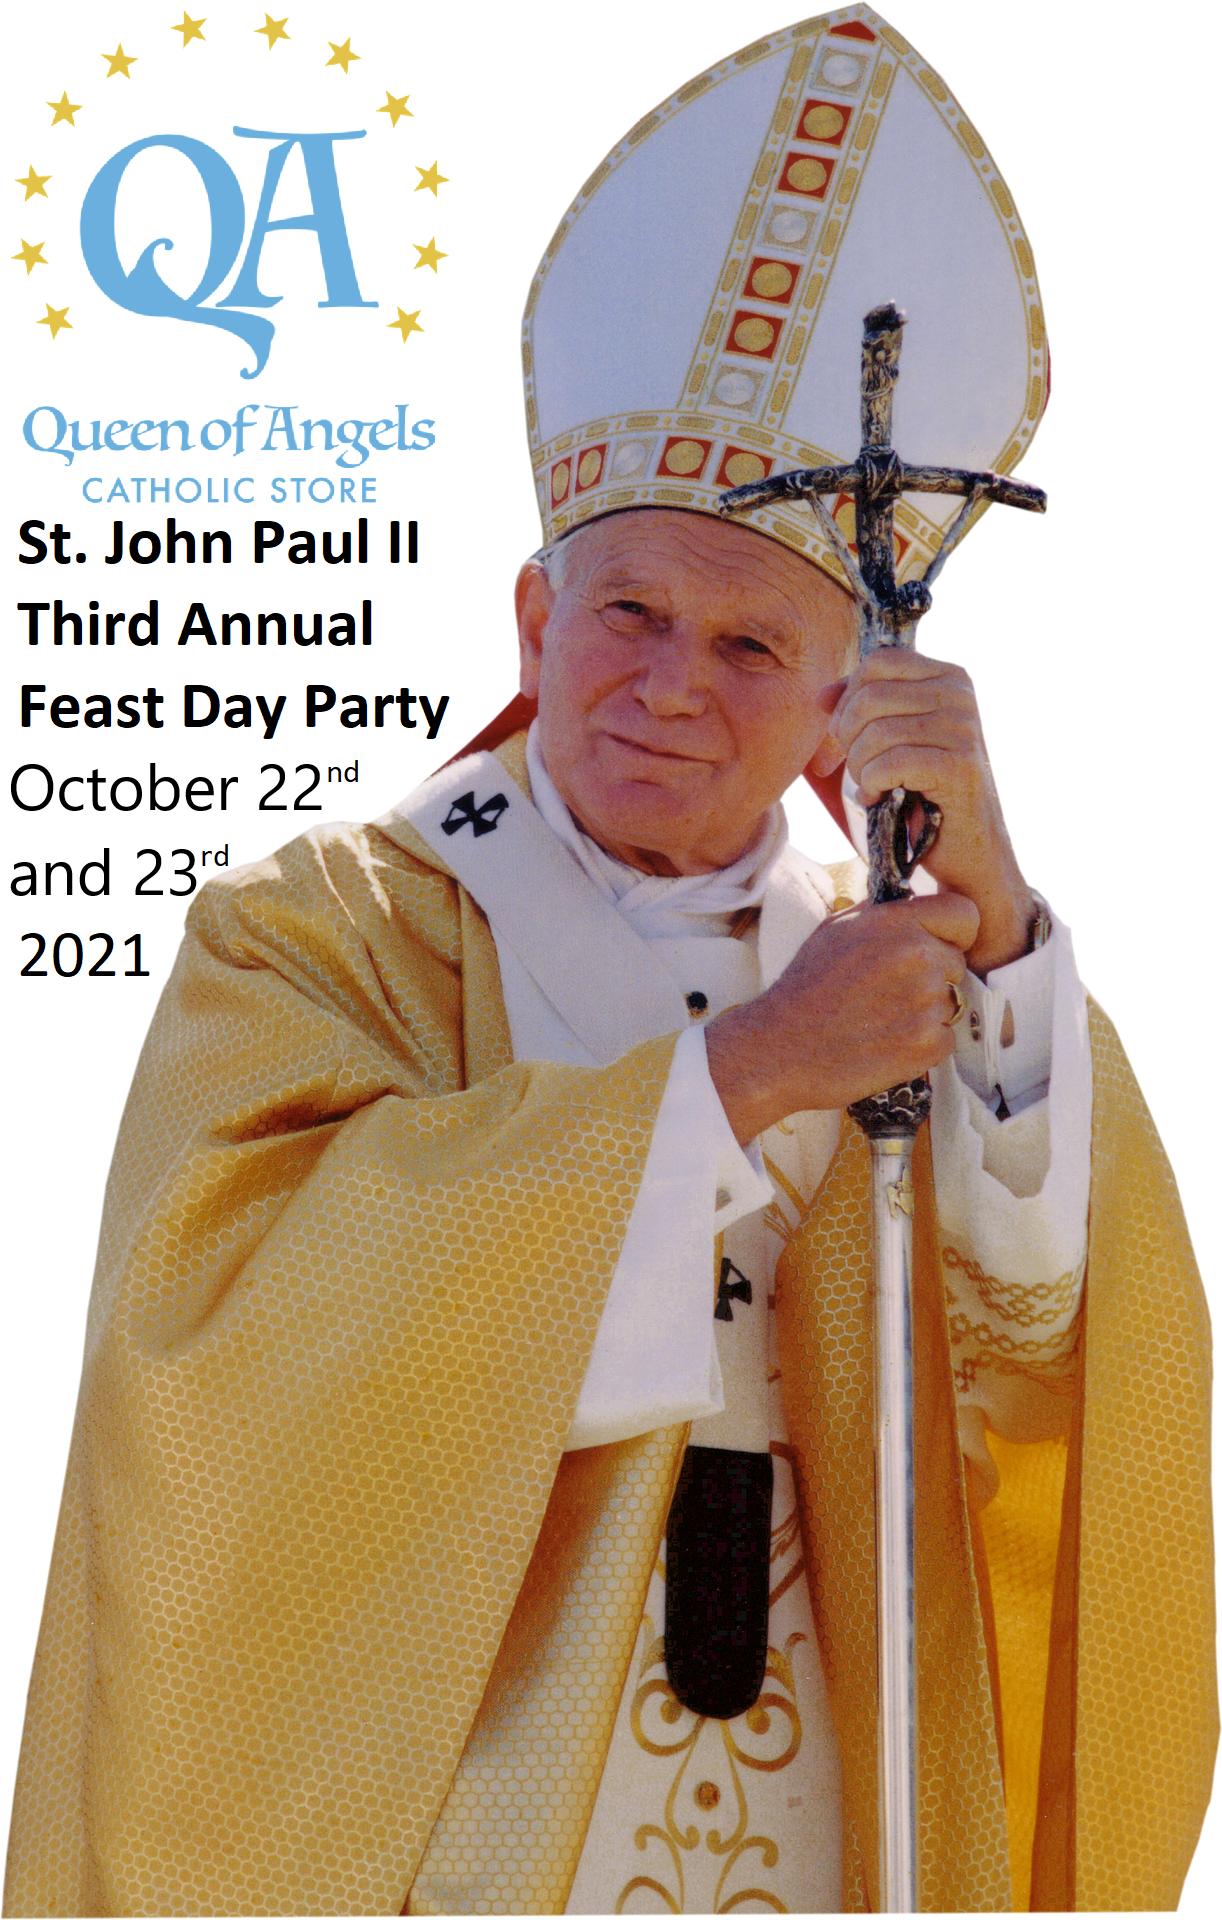 St. John Paul II Third Annual Feast Day Party